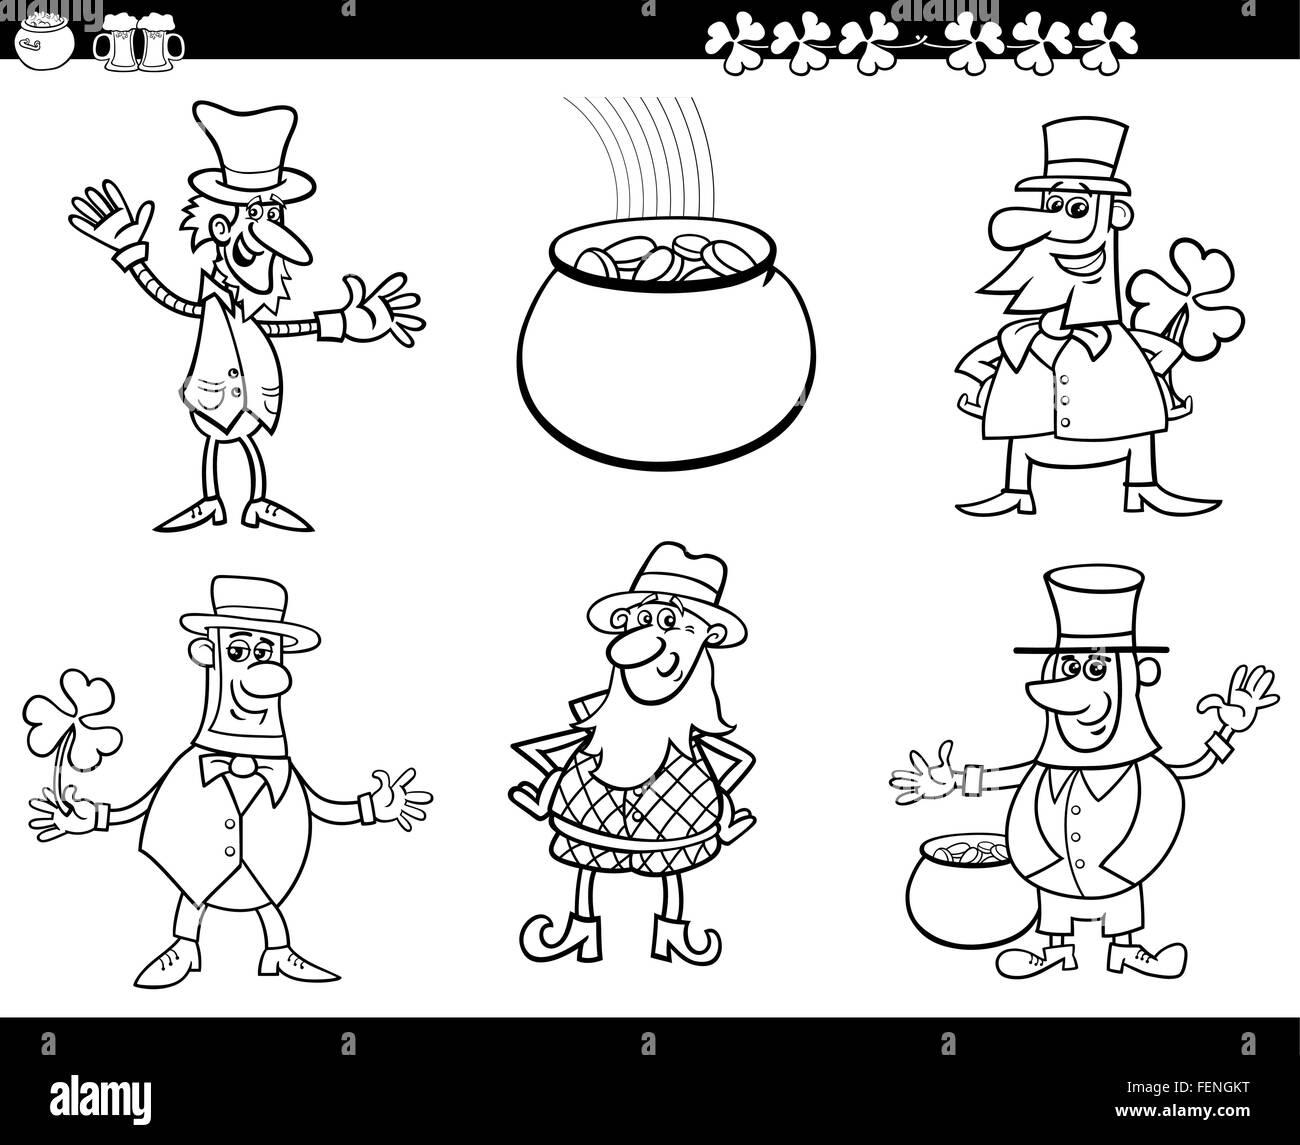 Gnome Black And White Stockfotos & Gnome Black And White Bilder ...